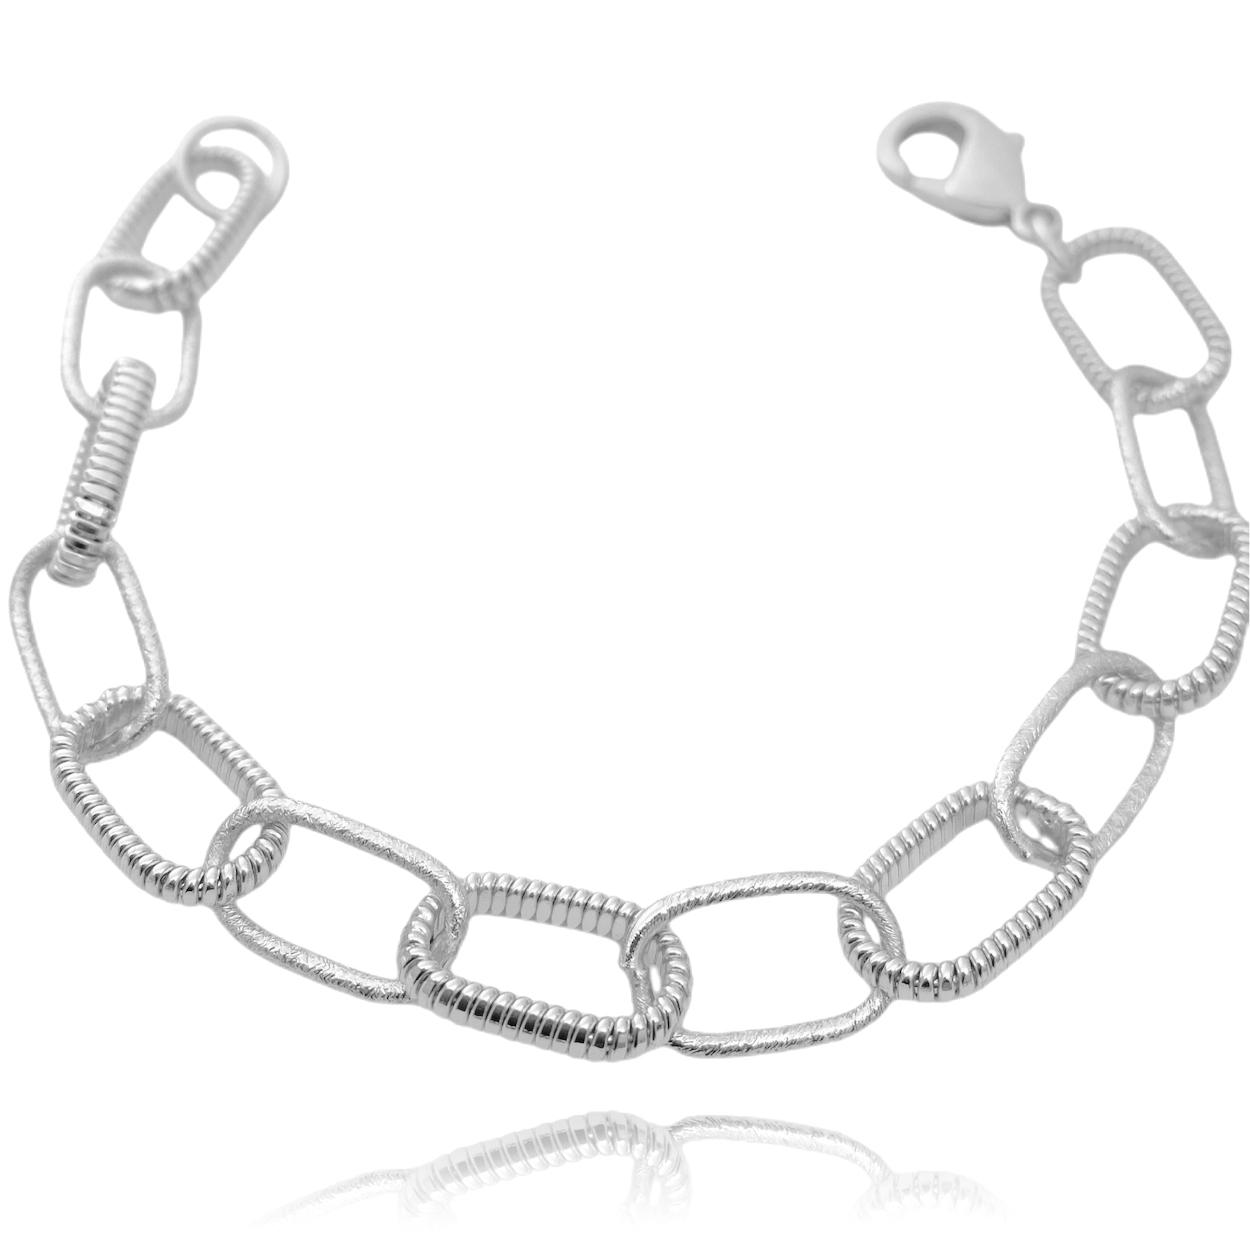 Pulseira Chain Elos Texturizados (Banho Prata 925)